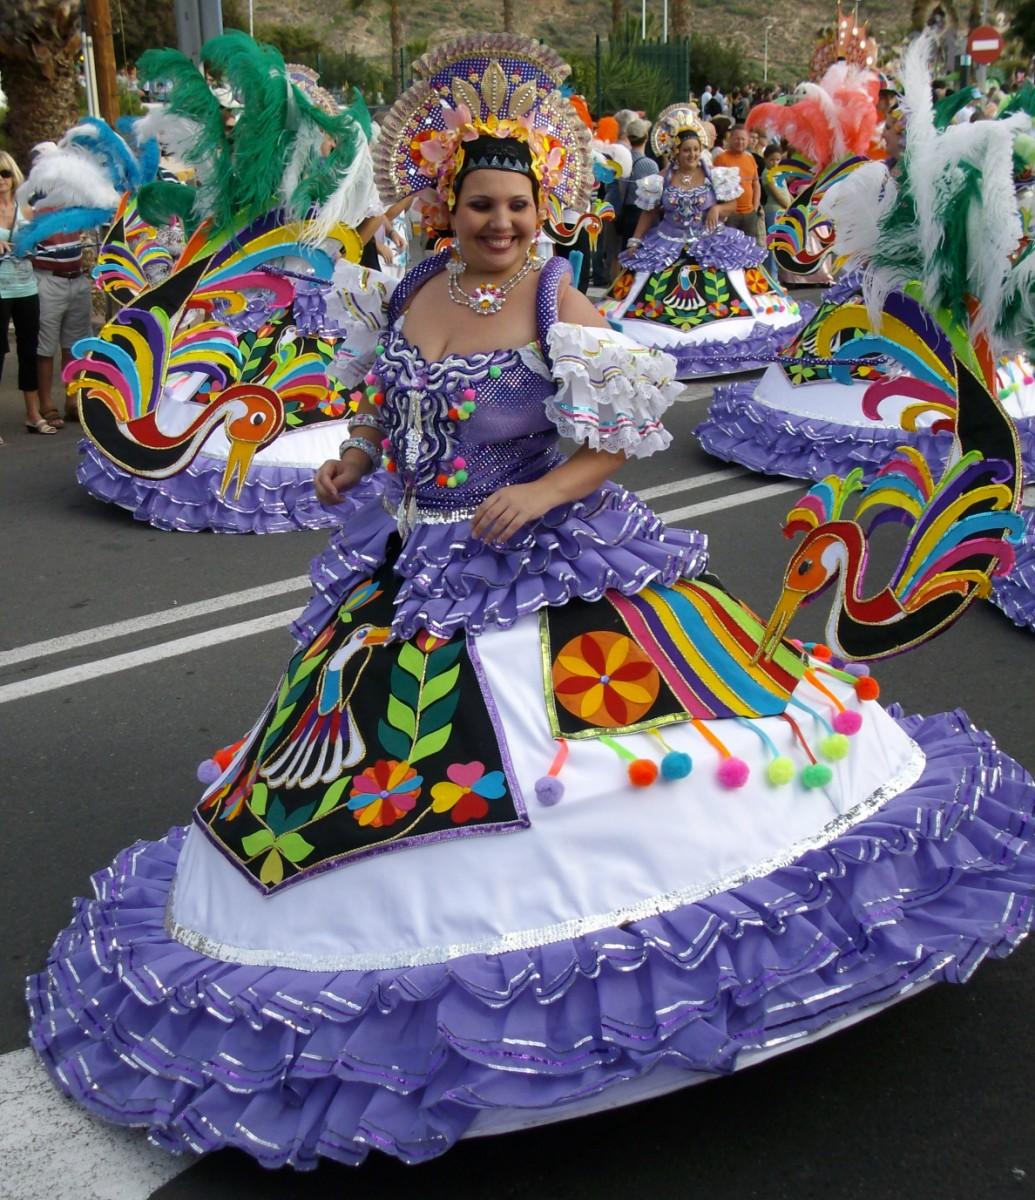 Carnaval in Los Cristianos, Tenerife - March 2010